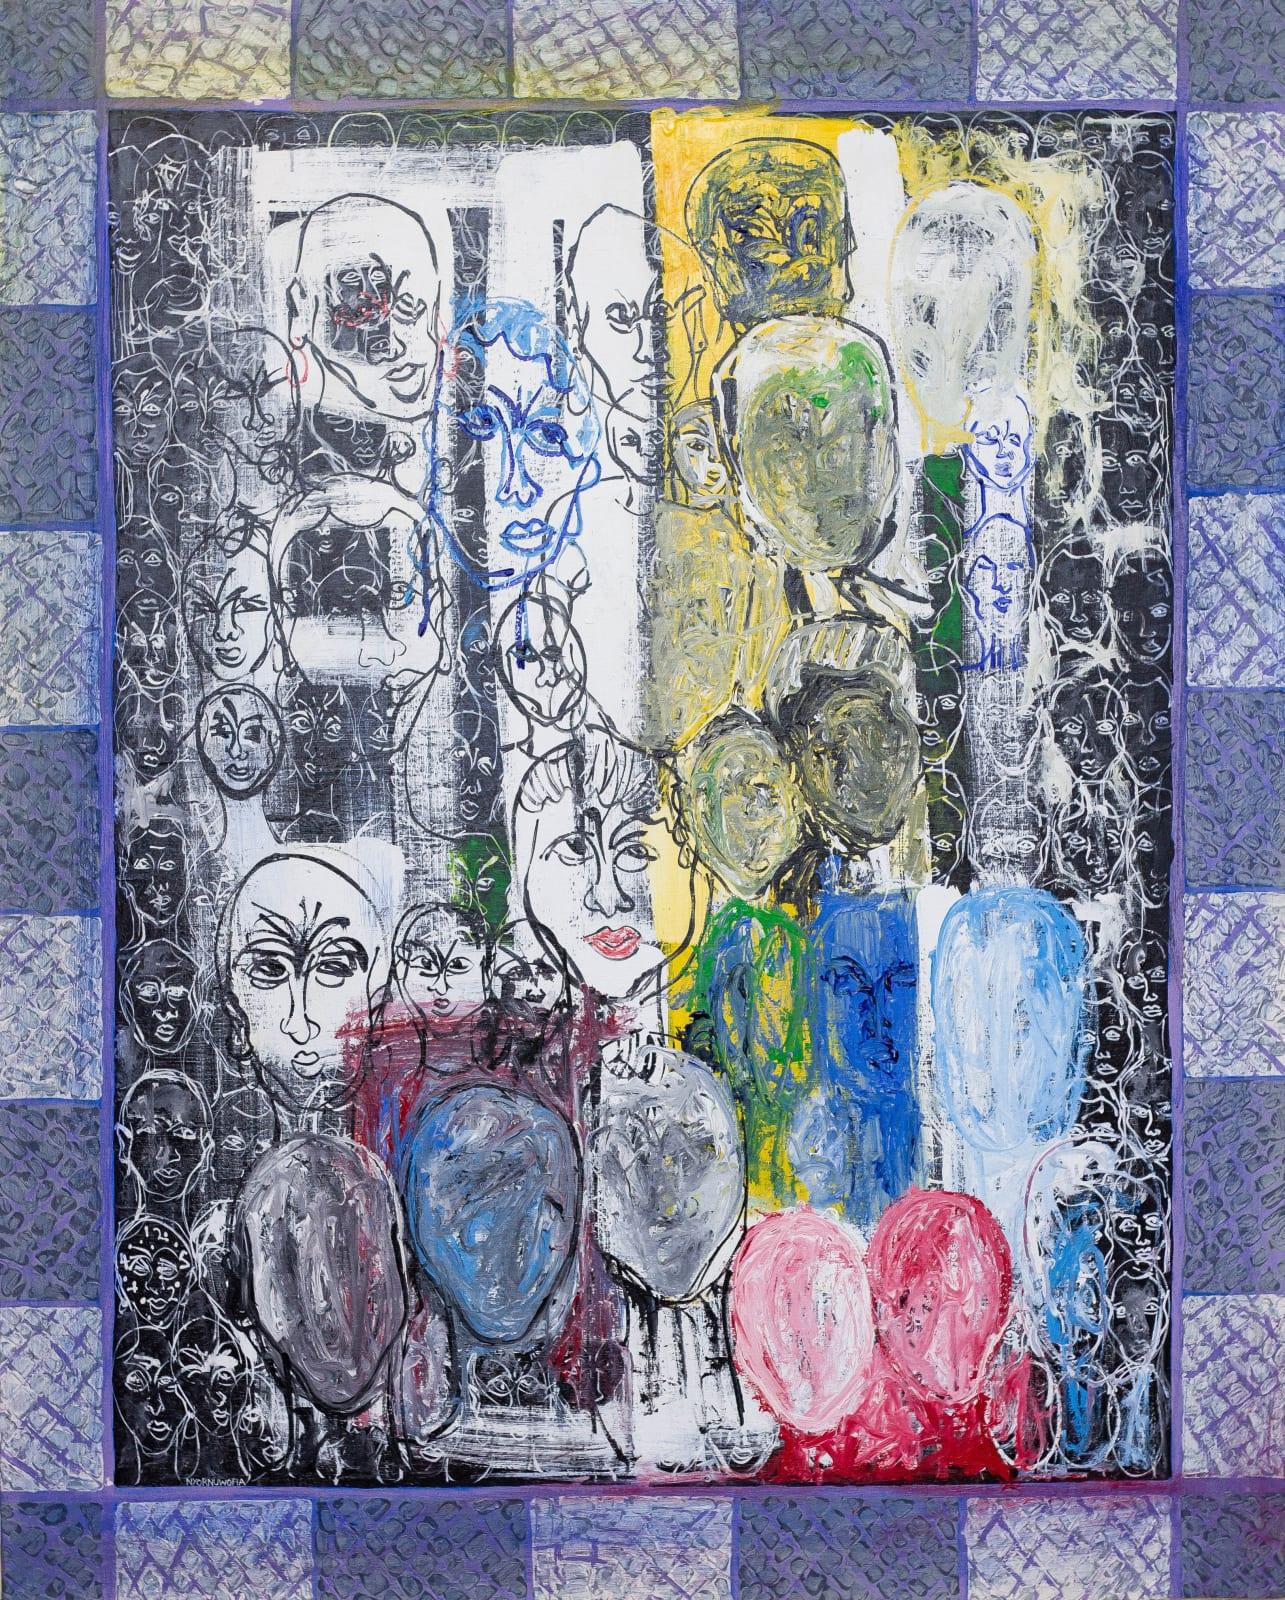 Nyornuwofia Agorsor Positive Moods (2015) 153 x 123 cm Acrylic on canvas